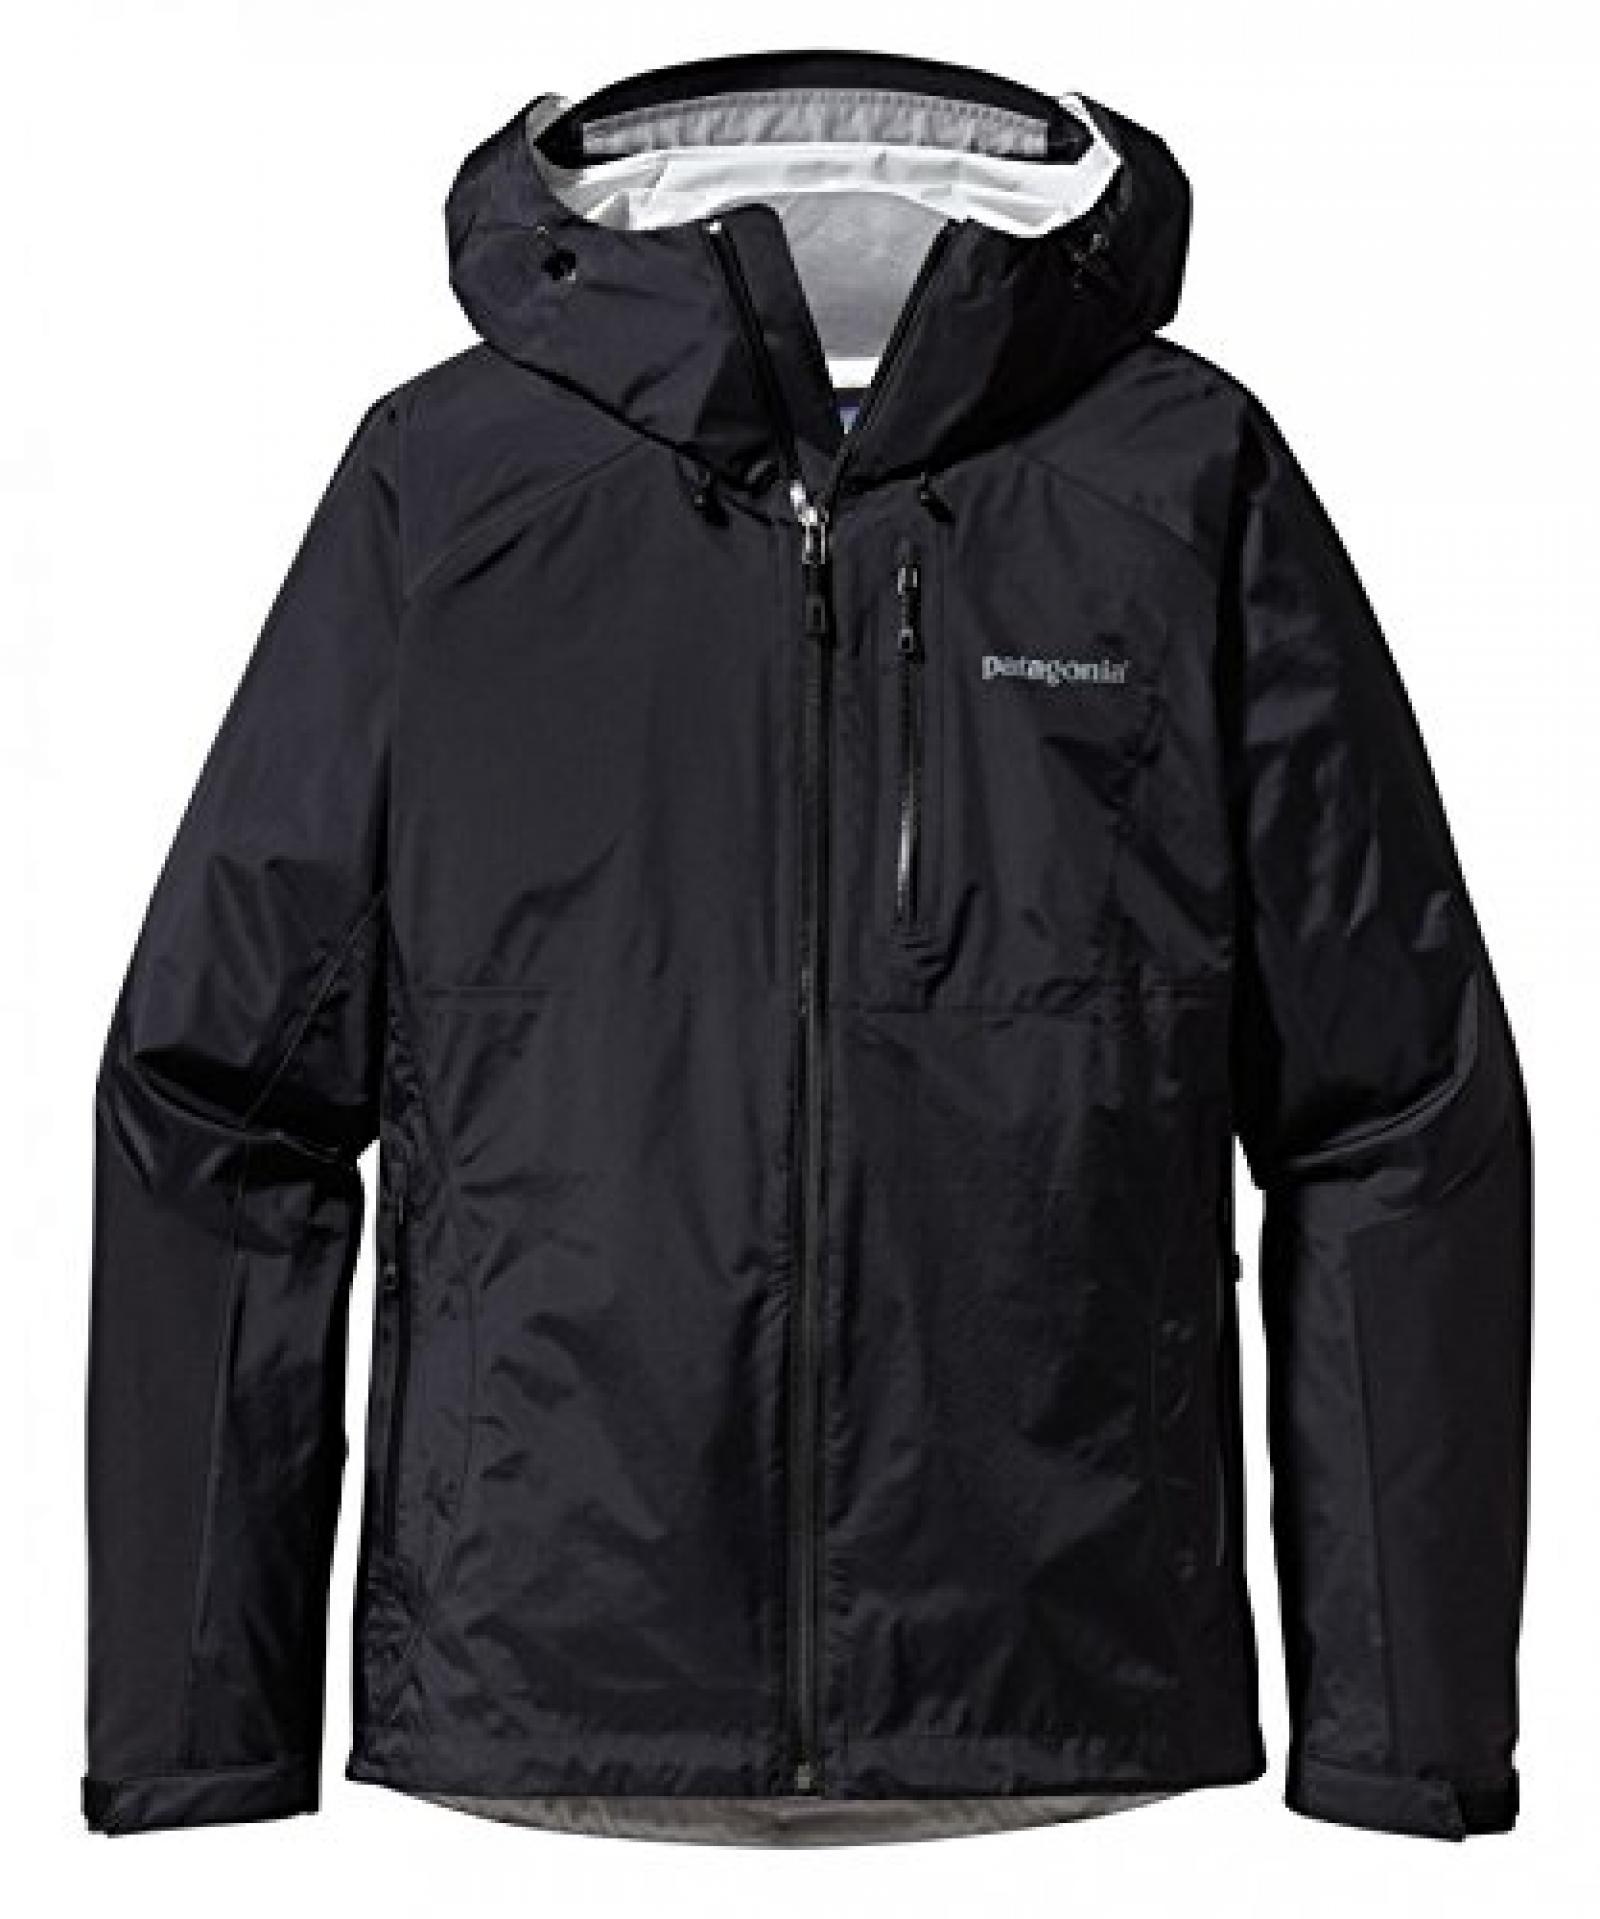 Patagonia Torrentshell Stretch Jacket Women - Allwetterjacke